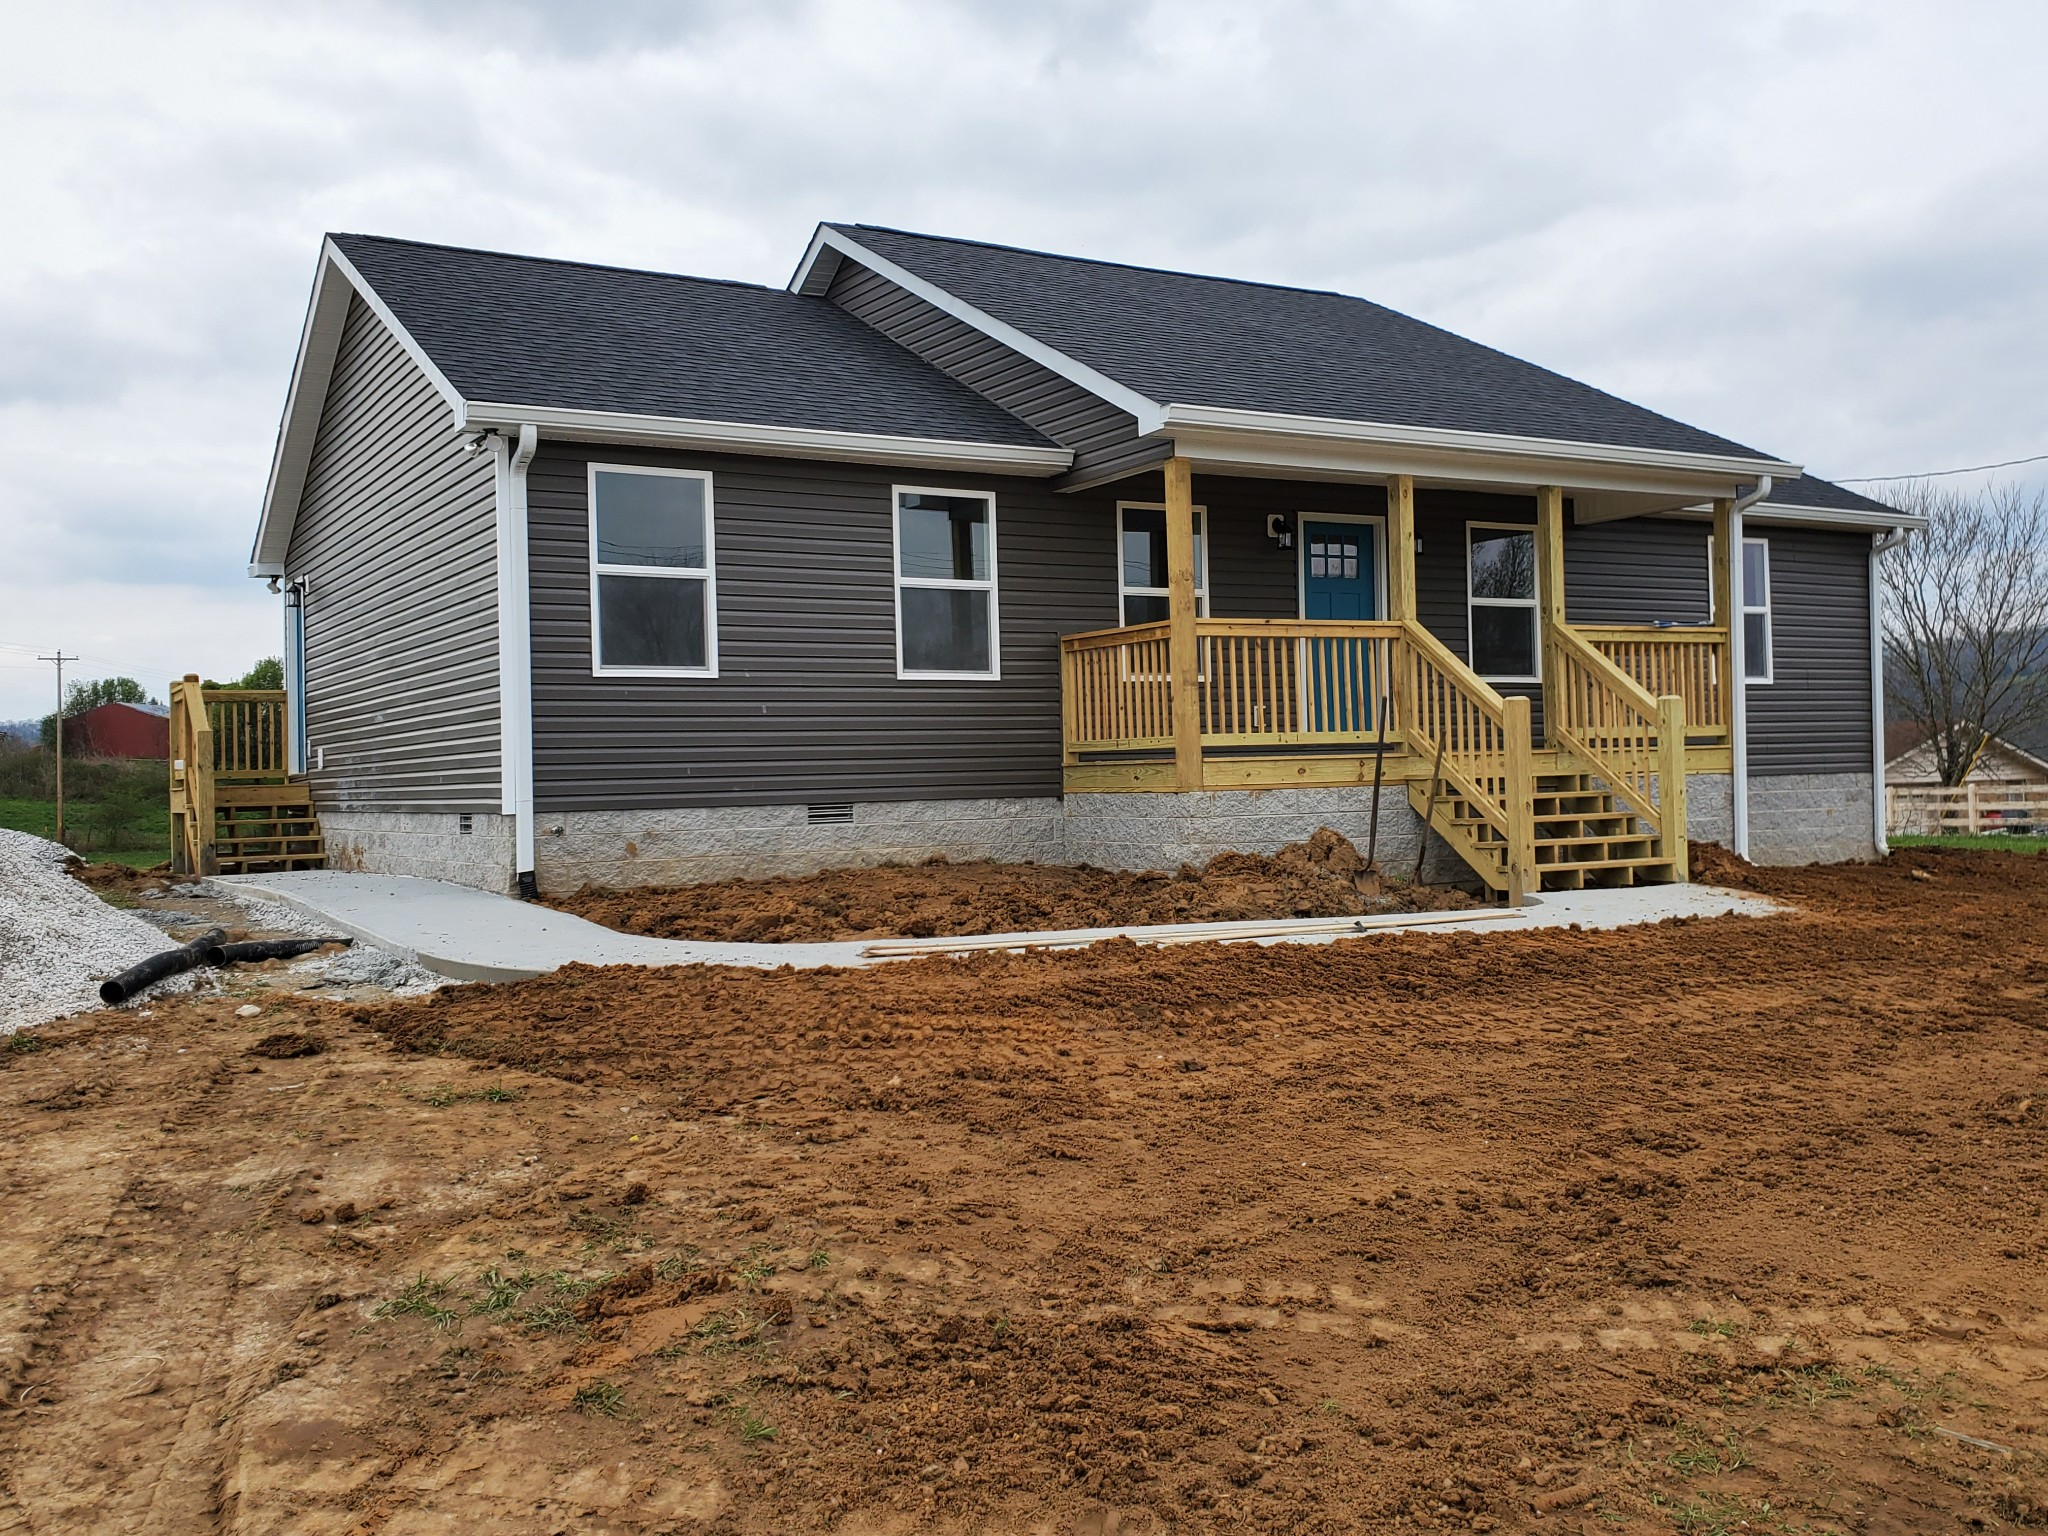 433 Hickman Rd, Liberty, TN 37095 - Liberty, TN real estate listing